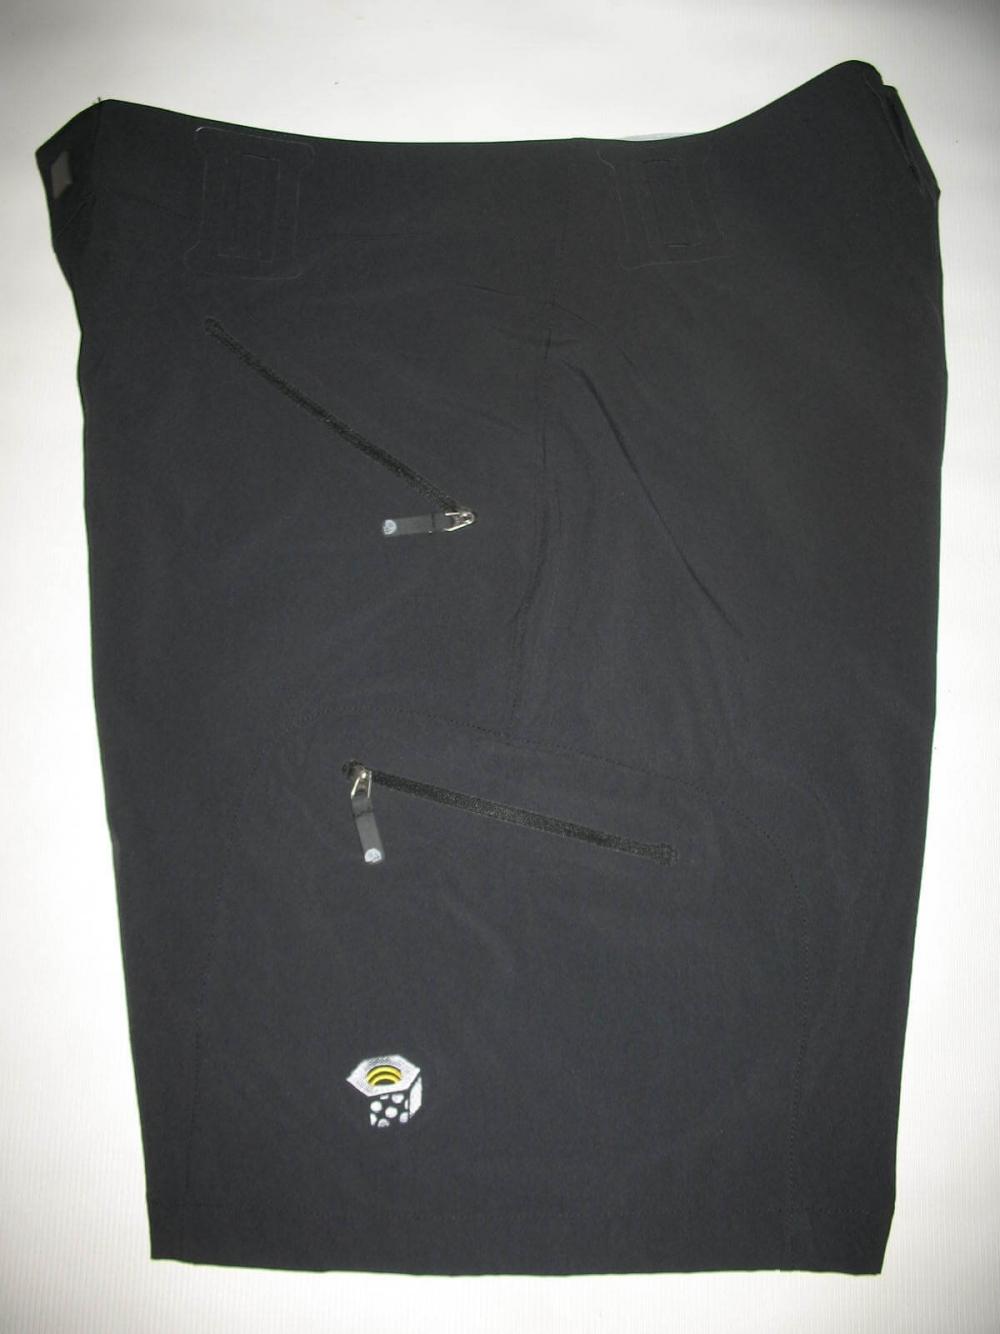 Шорты MOUNTAIN HARDWEAR outdoor shorts (размер L) - 1